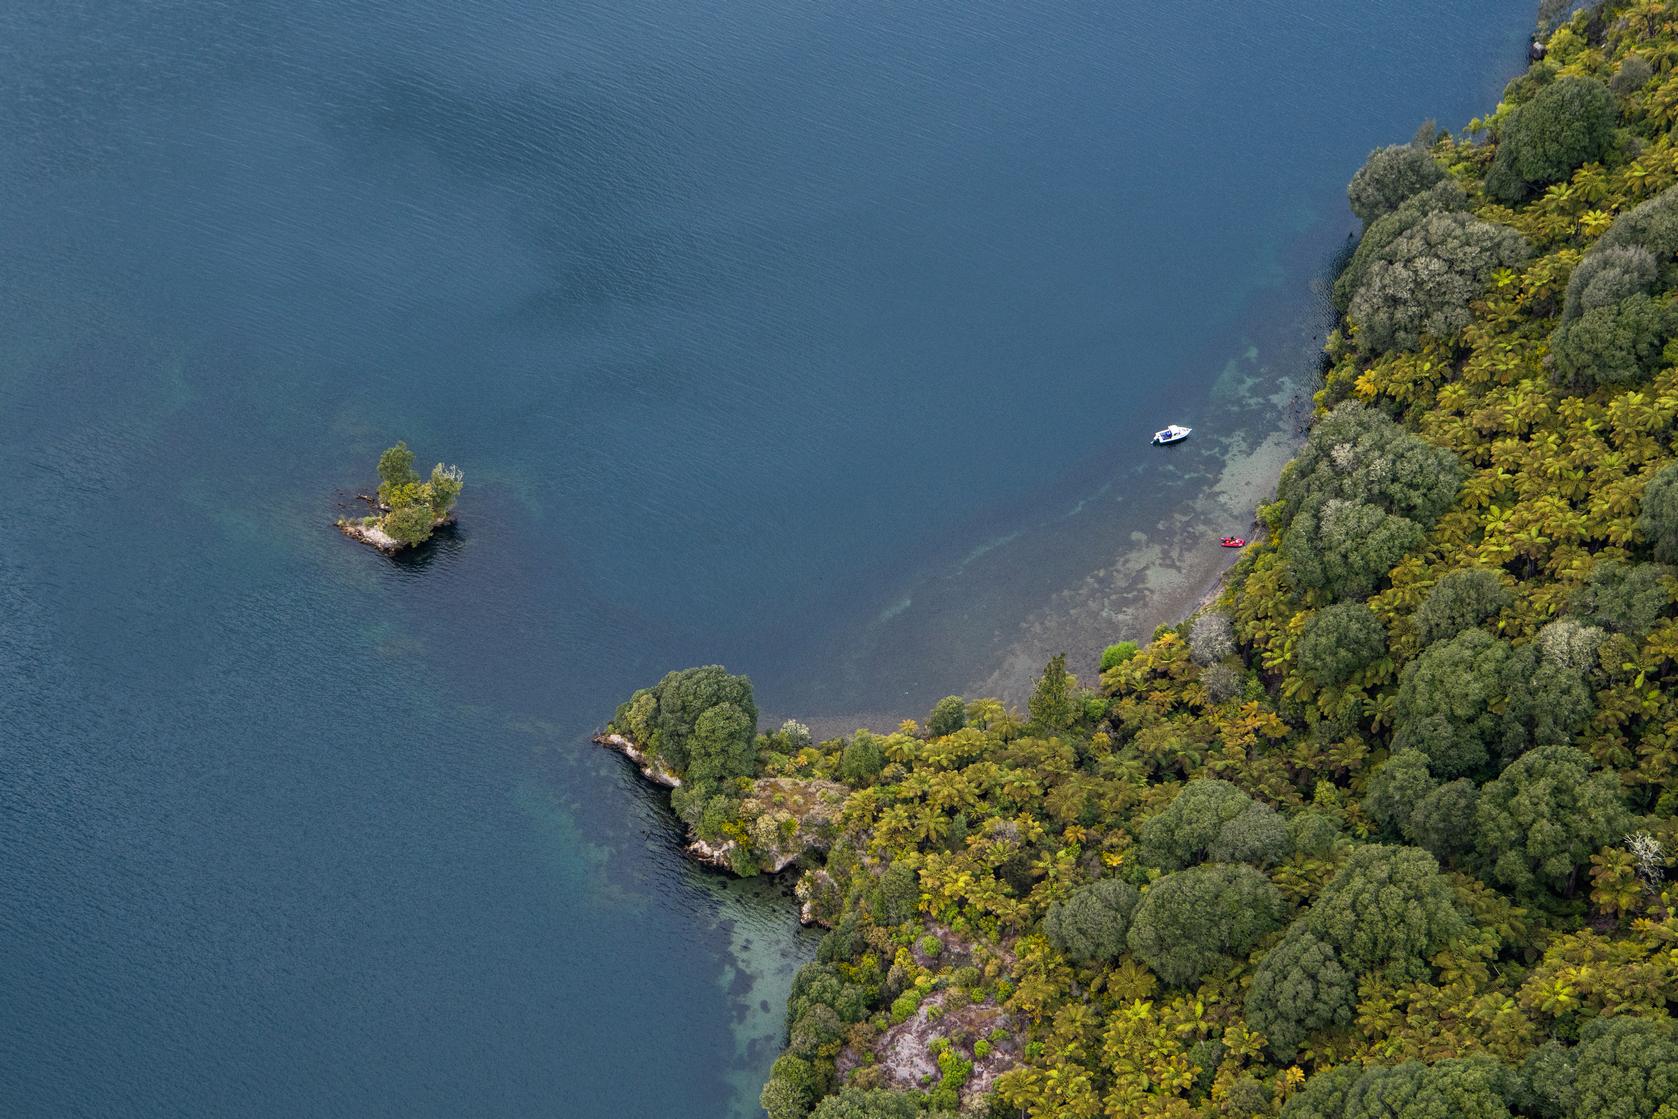 Small Island in a Rotorua Lake